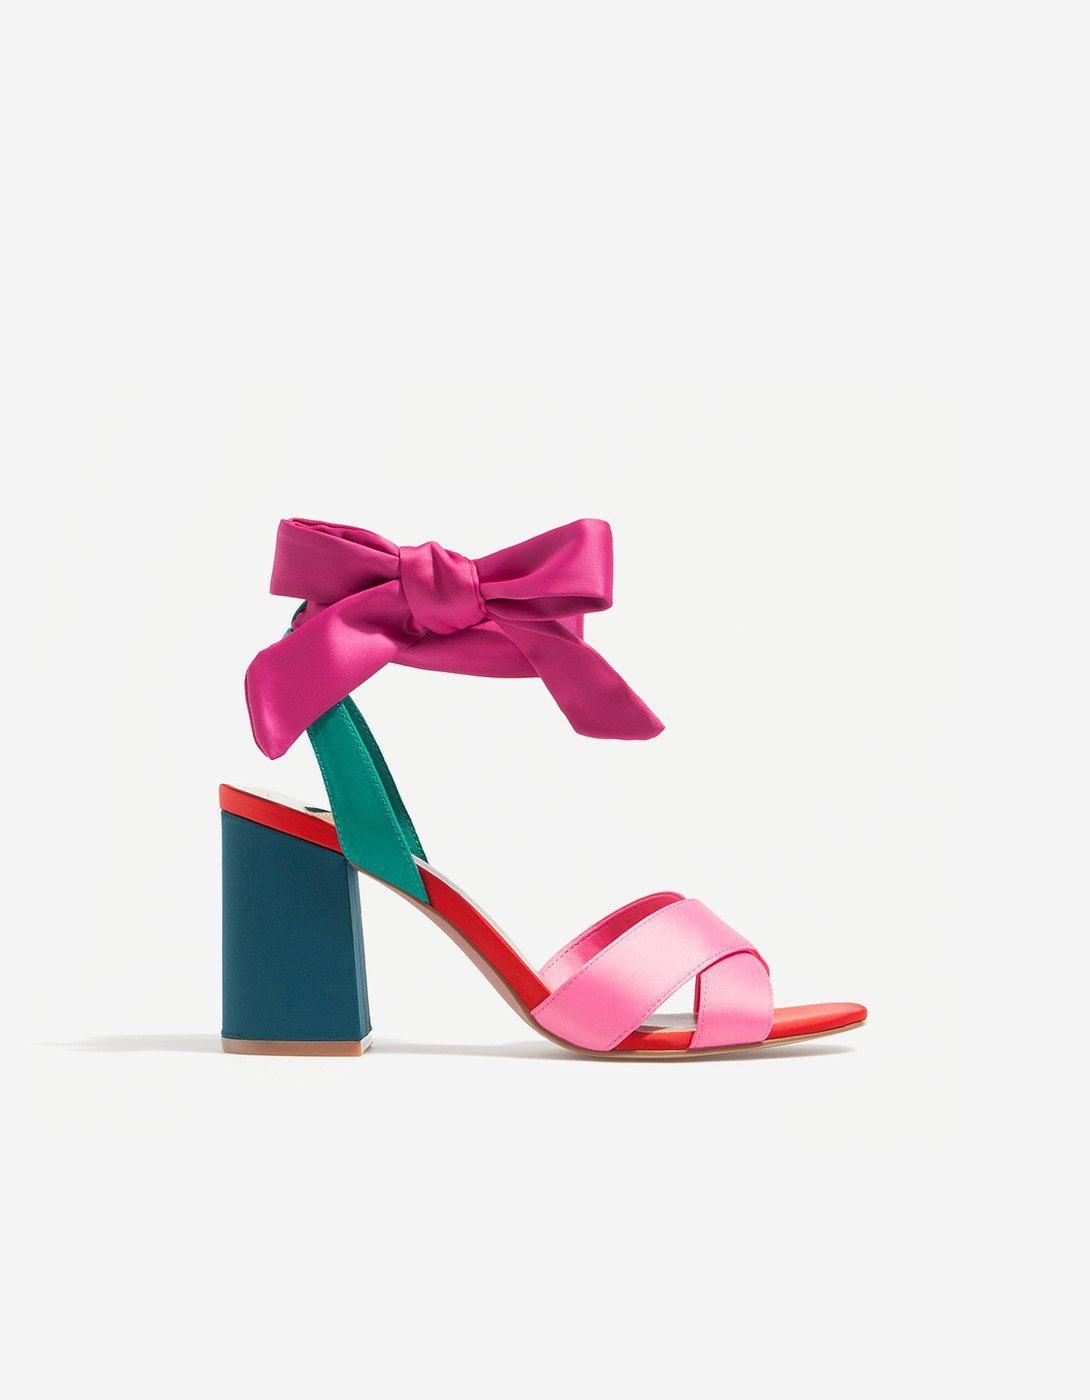 Tacón Raso De Stradivarius Combinada Zapatos Sandalia HYwxqAn